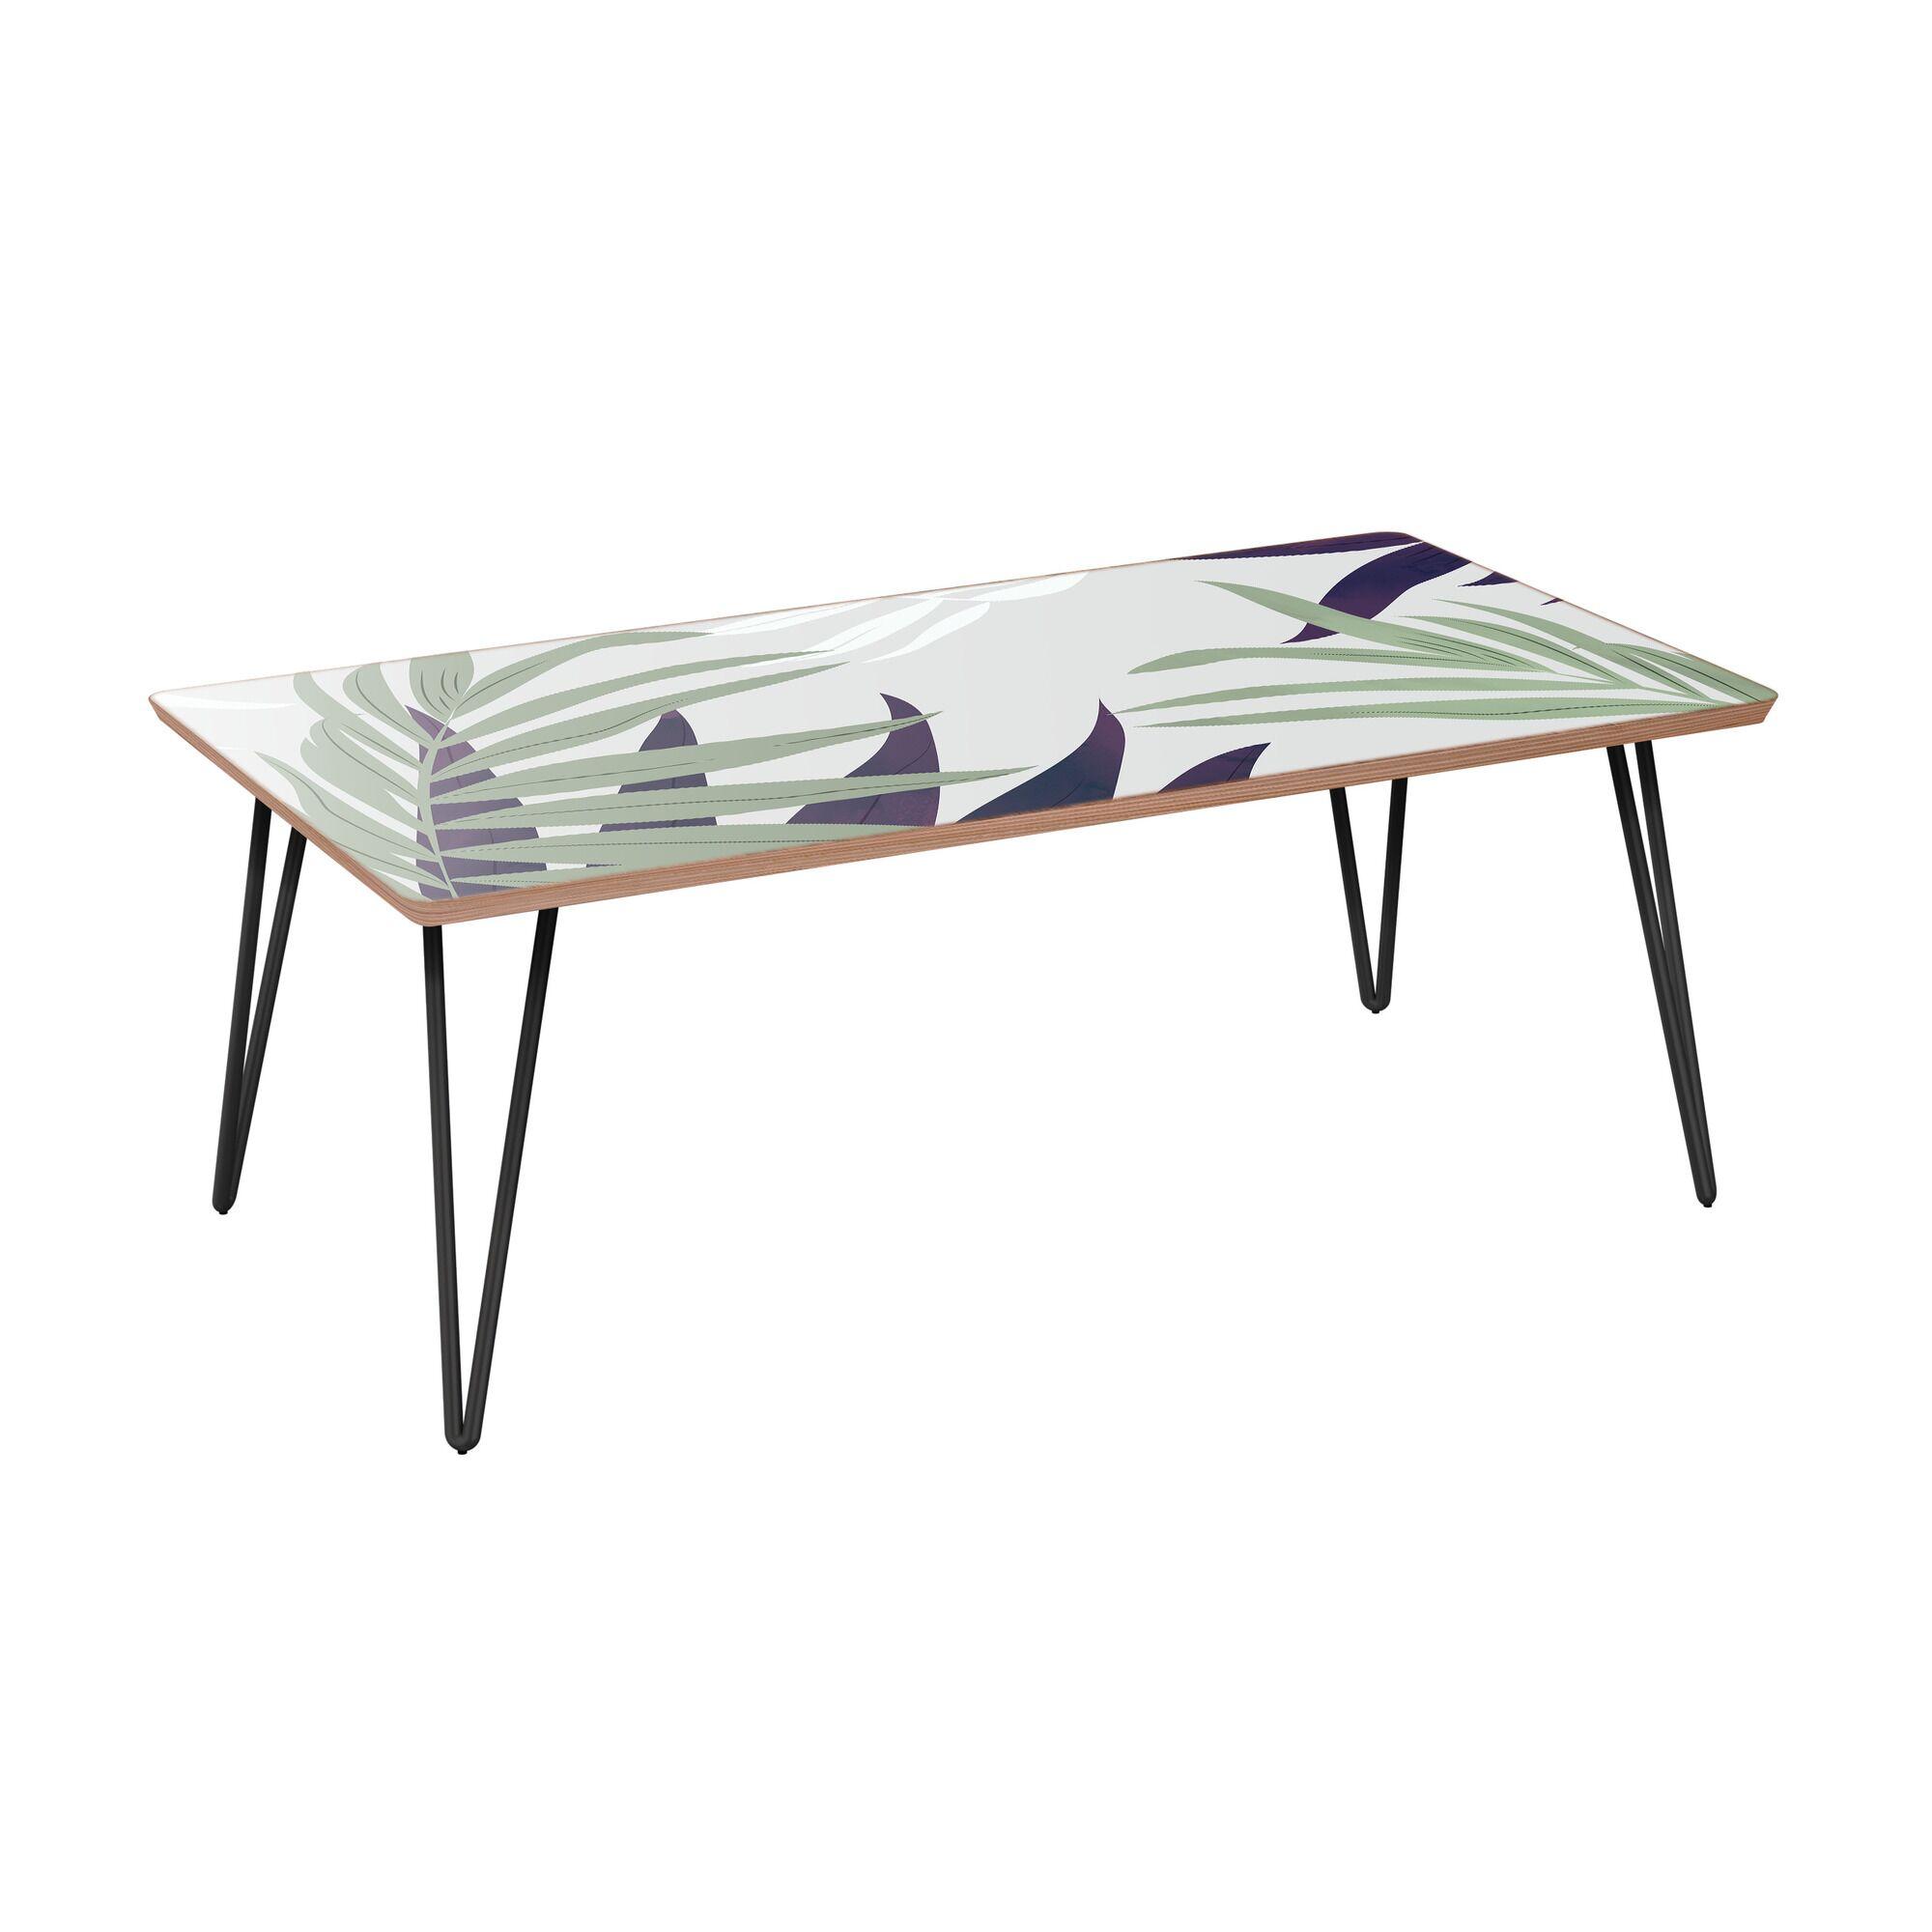 Retzlaff Coffee Table Table Base Color: Black, Table Top Color: Walnut